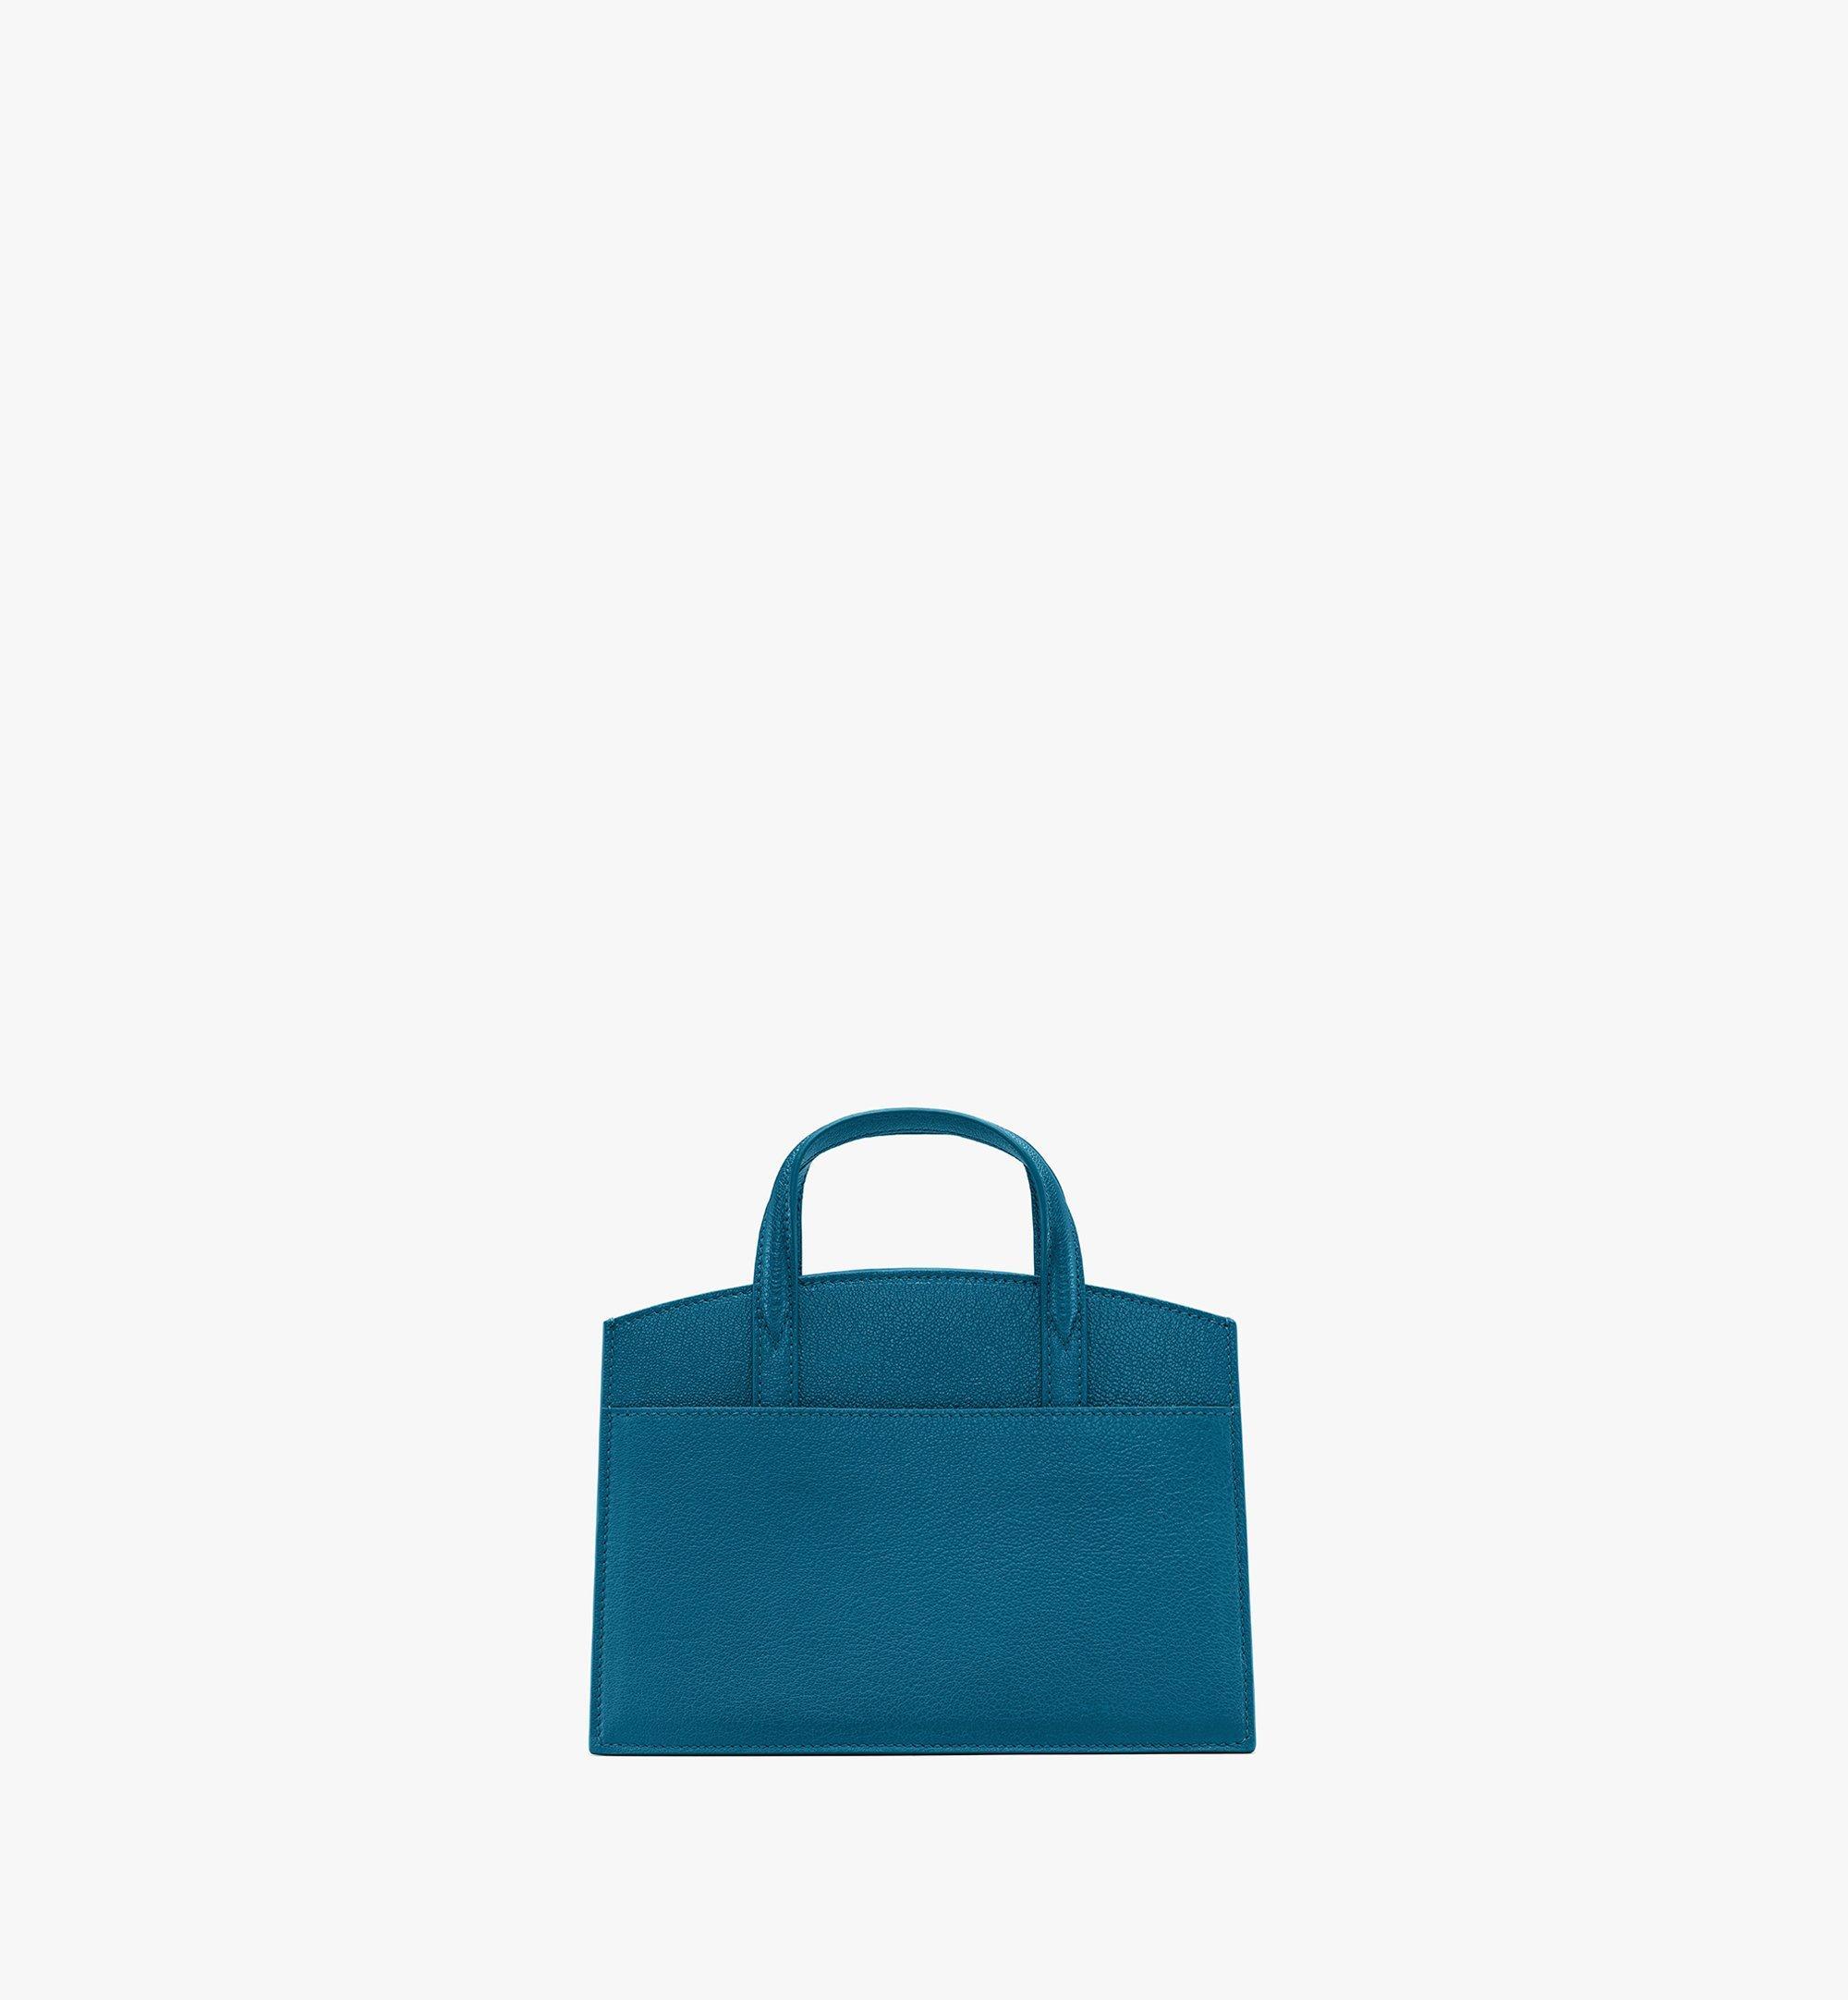 MCM Milano Tote Bag in Goatskin Leather Blue MWTASDA04JF001 Alternate View 3